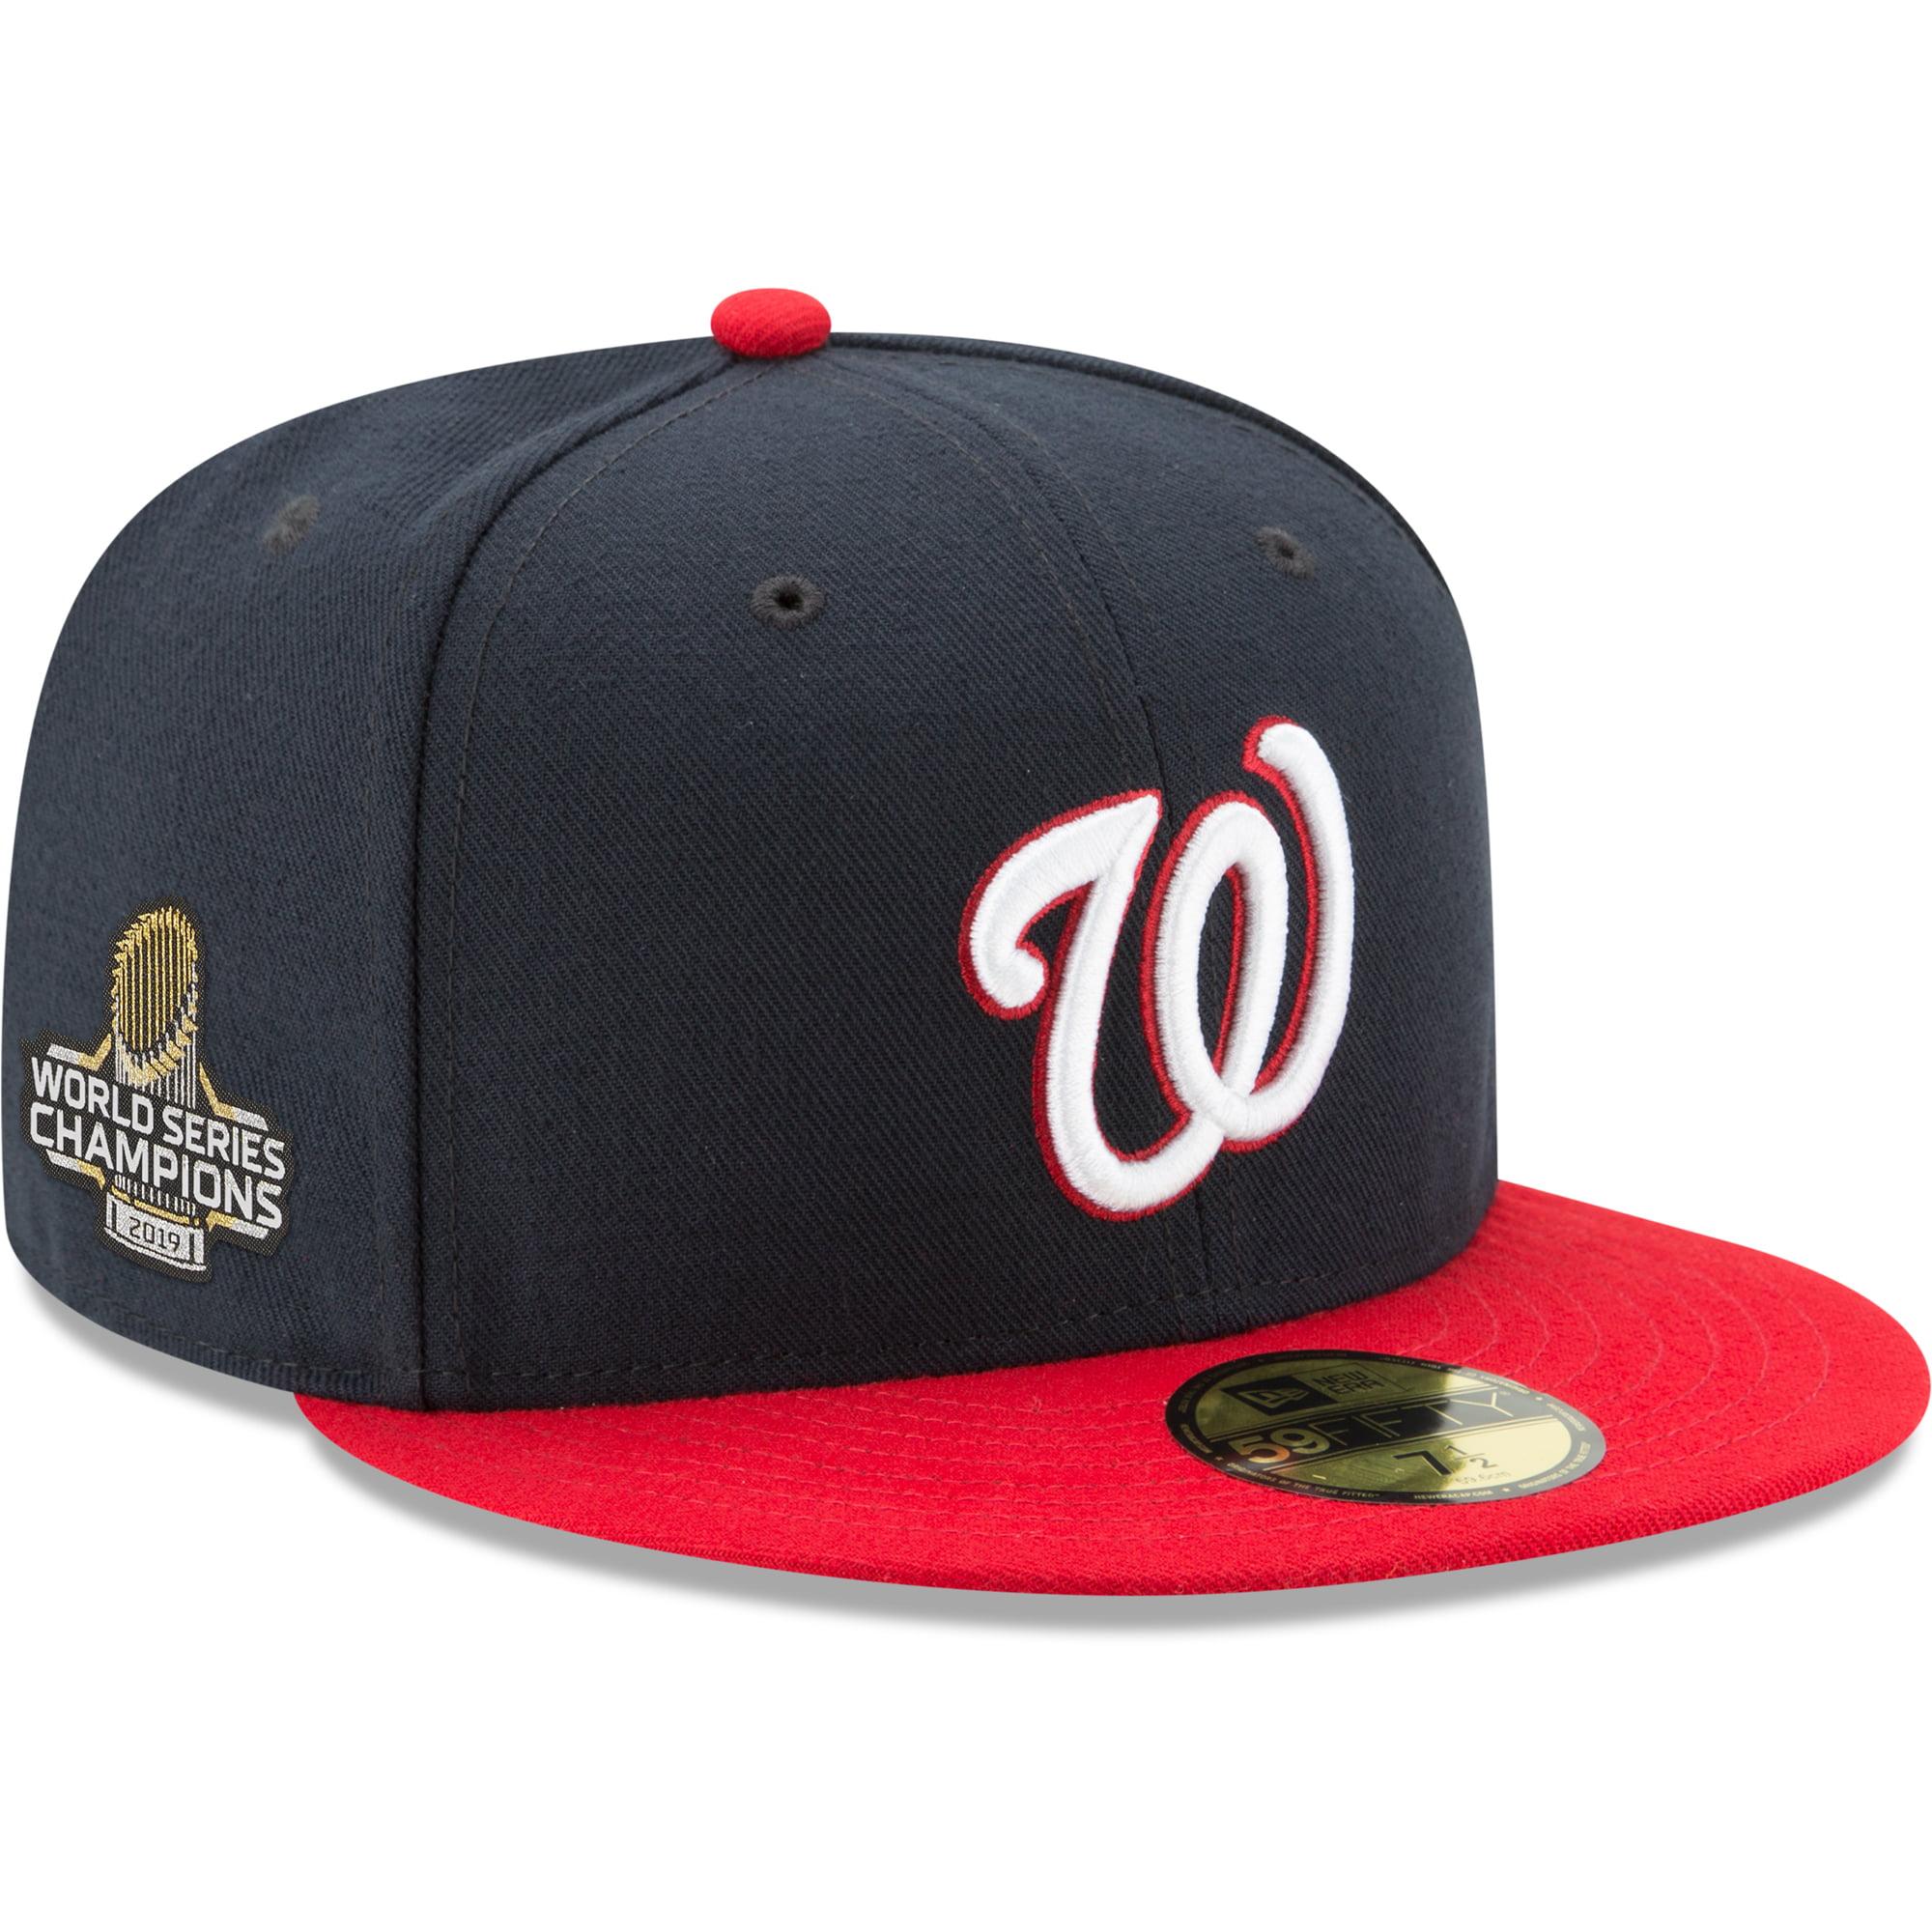 "New Era 59Fifty Cap MLB Washington Nationals /'08 /""DC/"" Kids Red Hat"